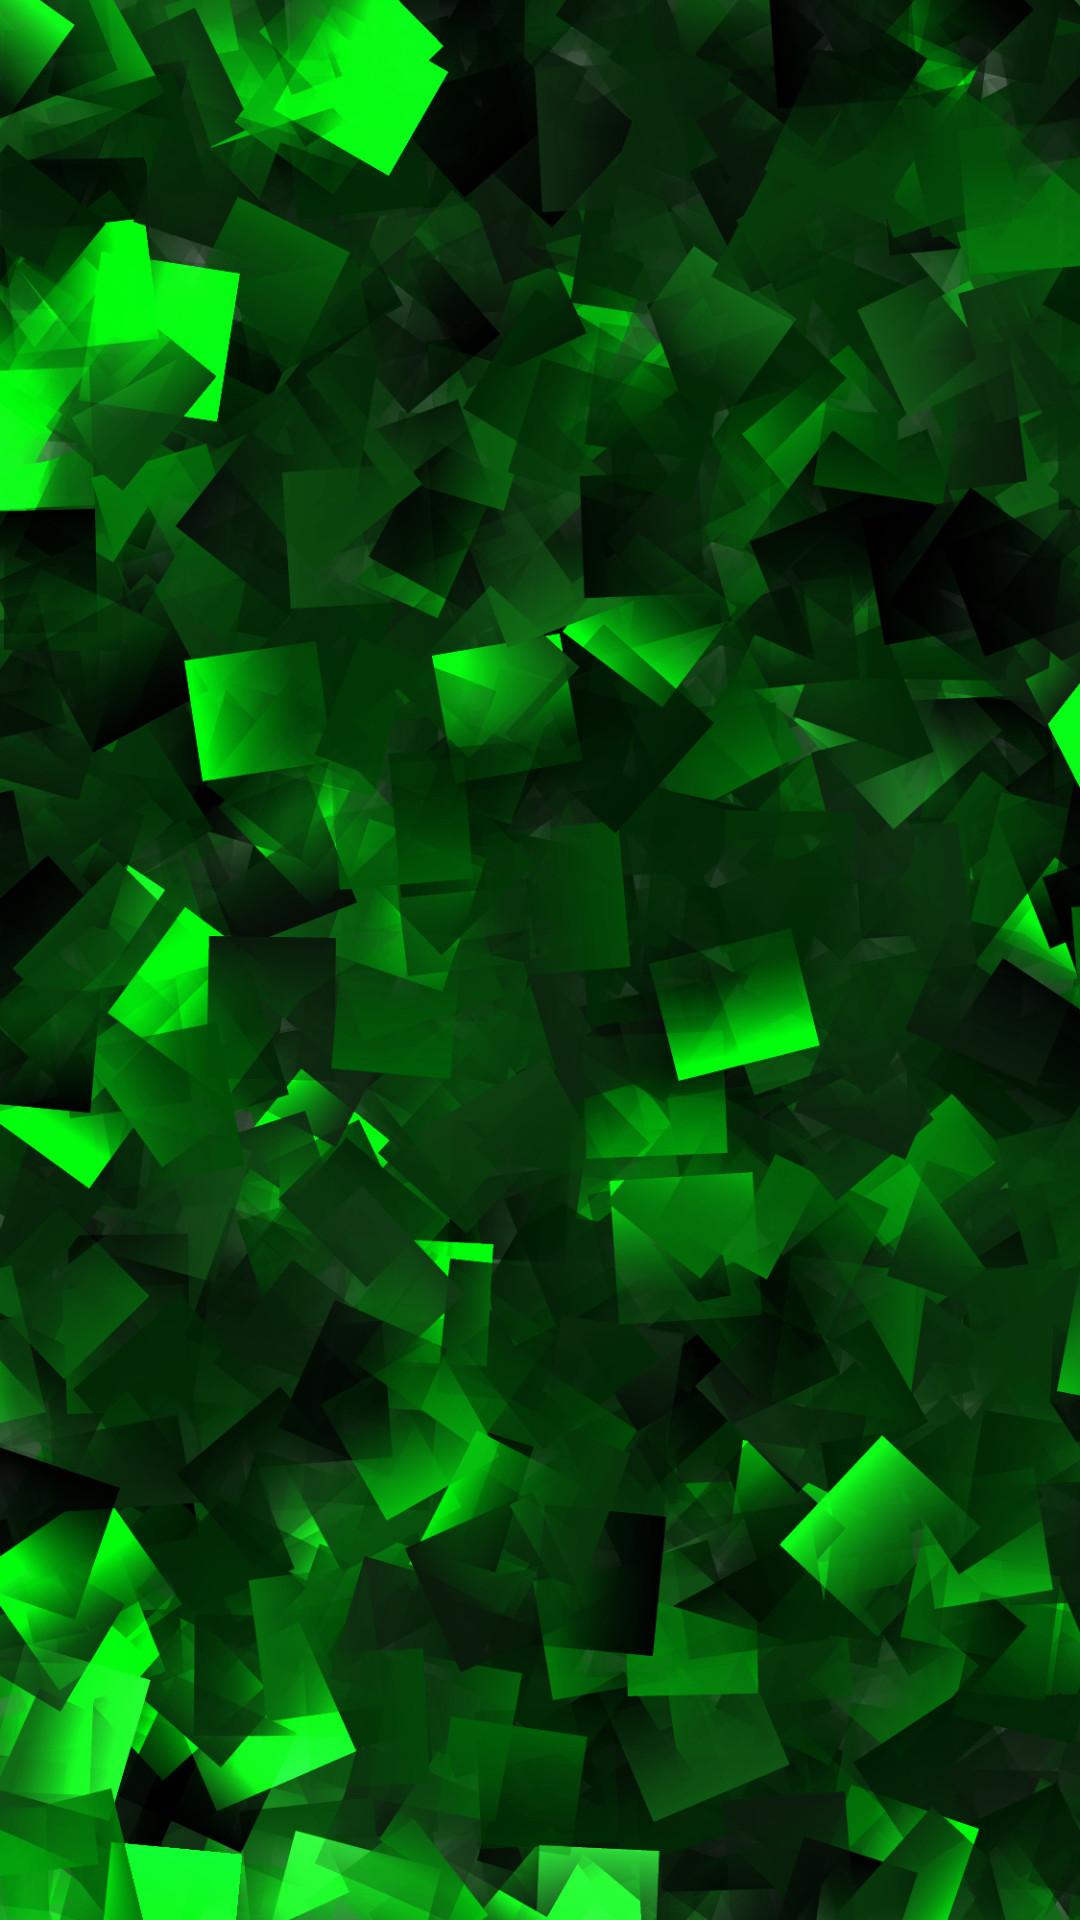 Green Phone Wallpaper 74 Images